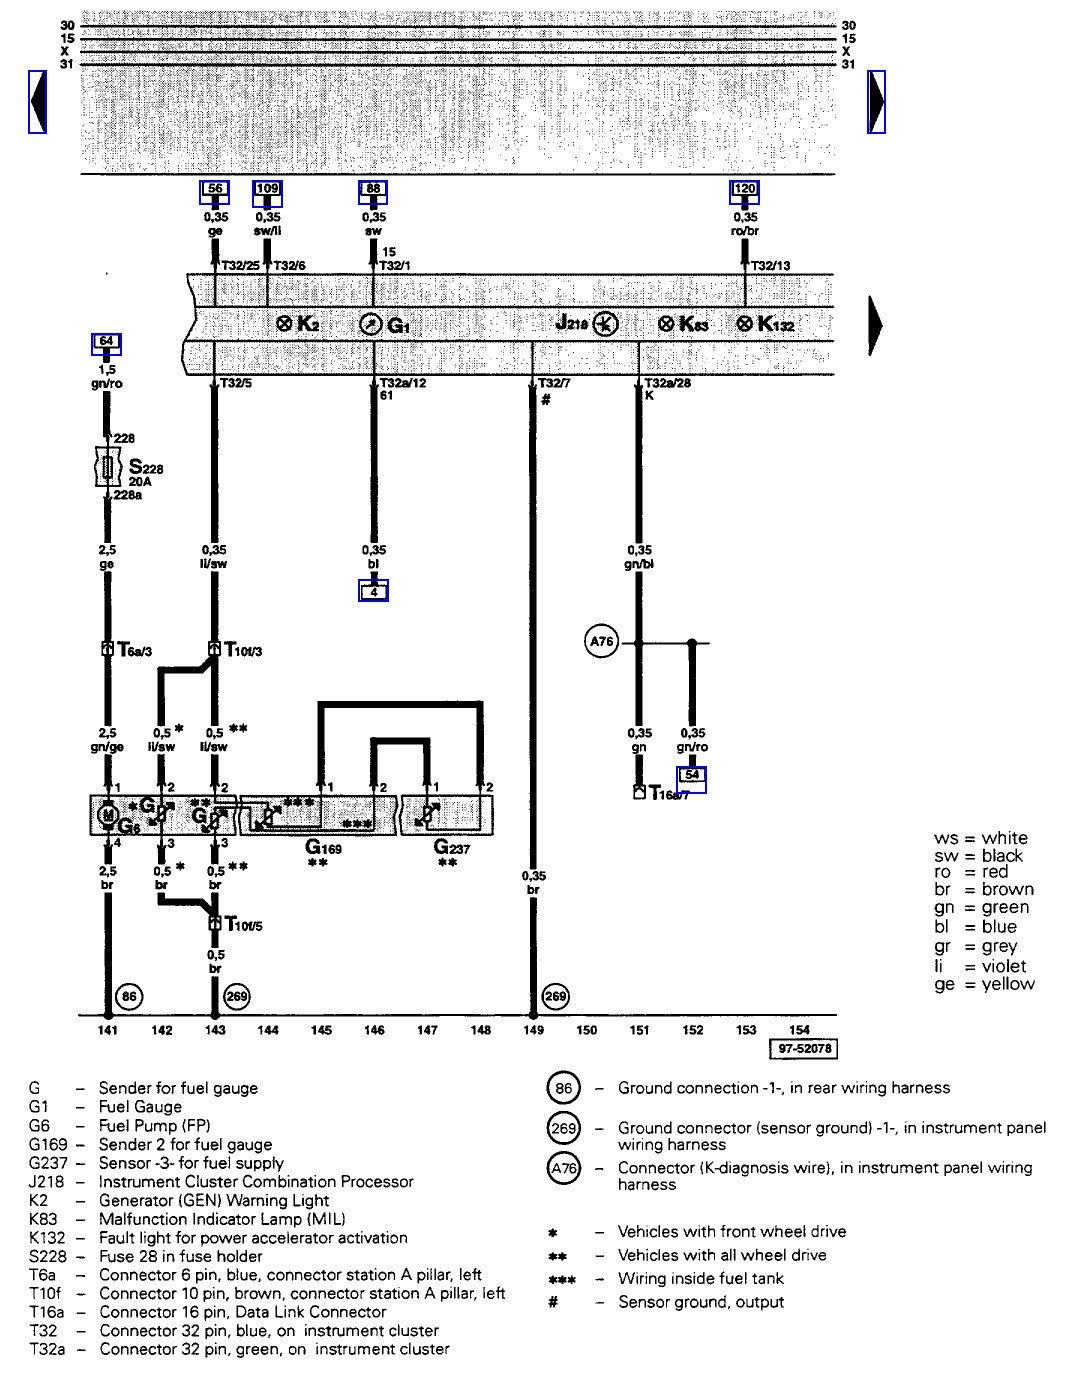 audi tt headlight wiring diagram wiring schematics diagram rh enr audi tt headlight wiring diagram audi tt headlight wiring diagram [ 1072 x 1385 Pixel ]